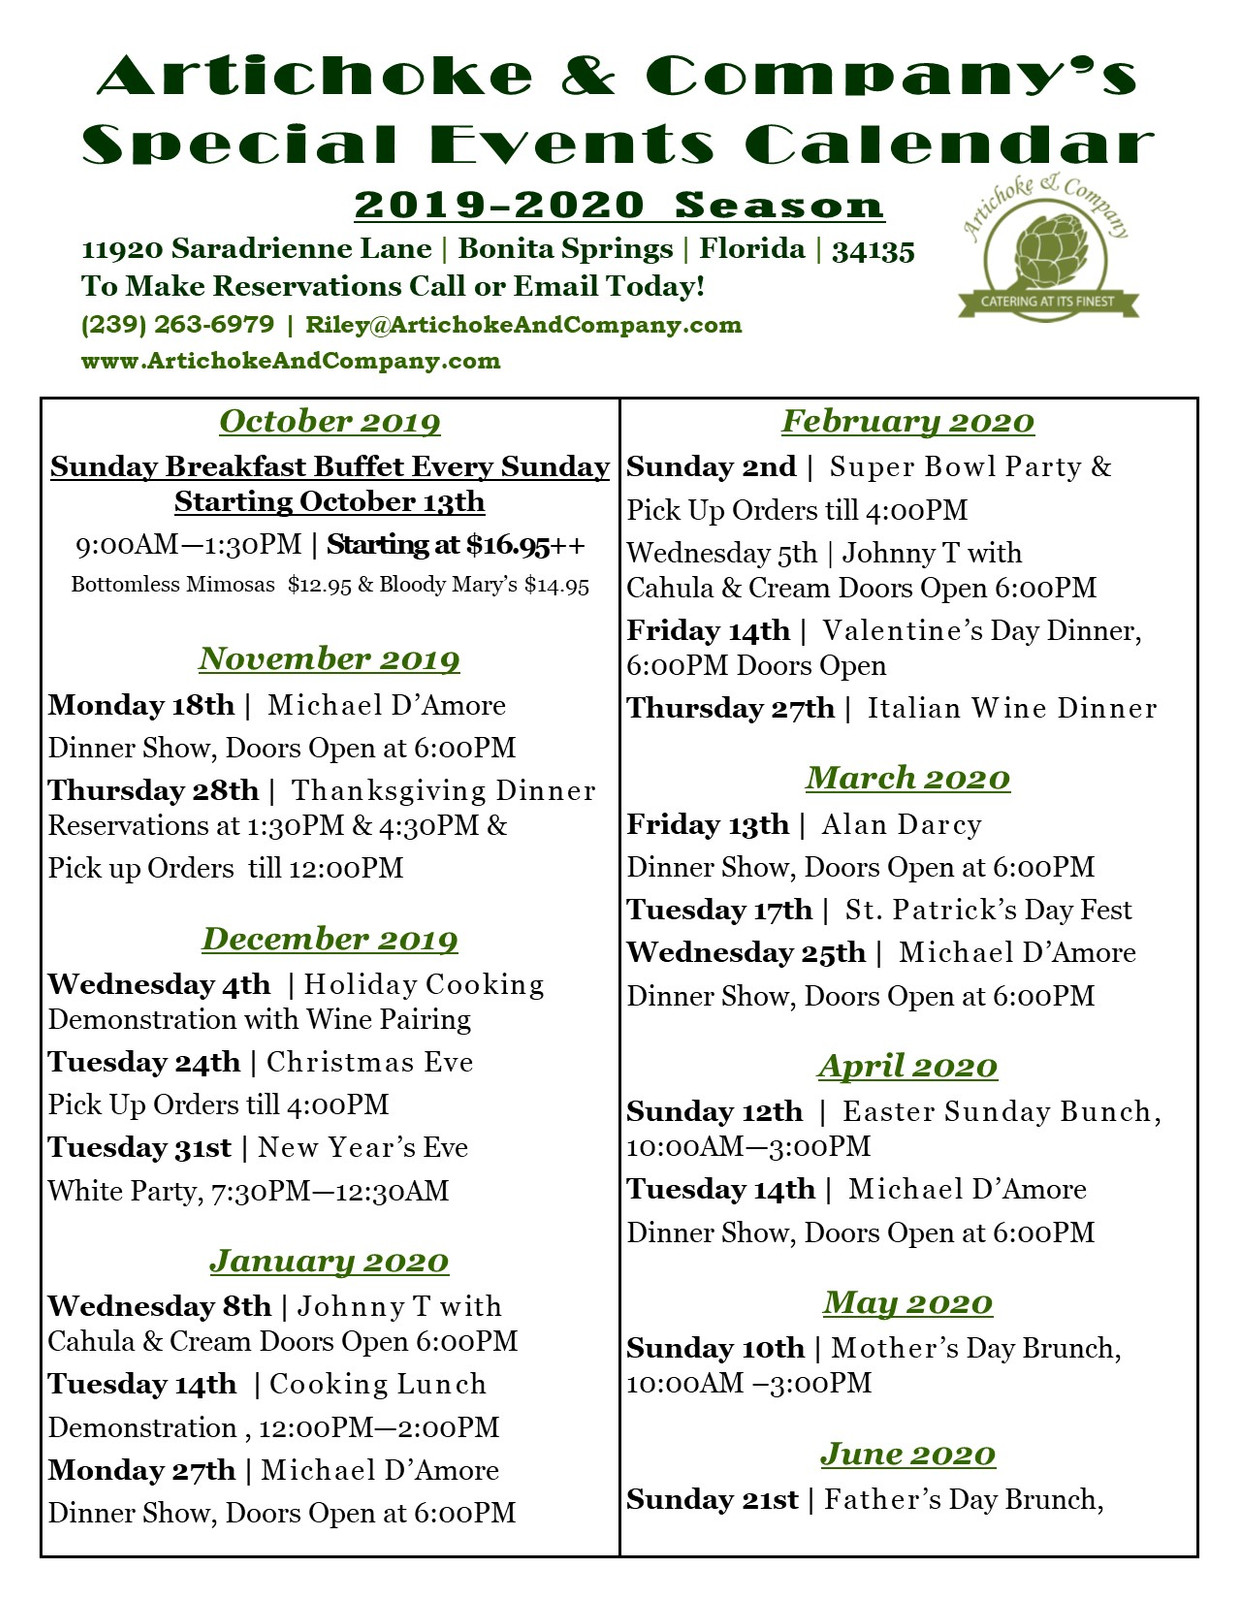 Special Events Calendar 2020 Special Events Calendar 2019 2020